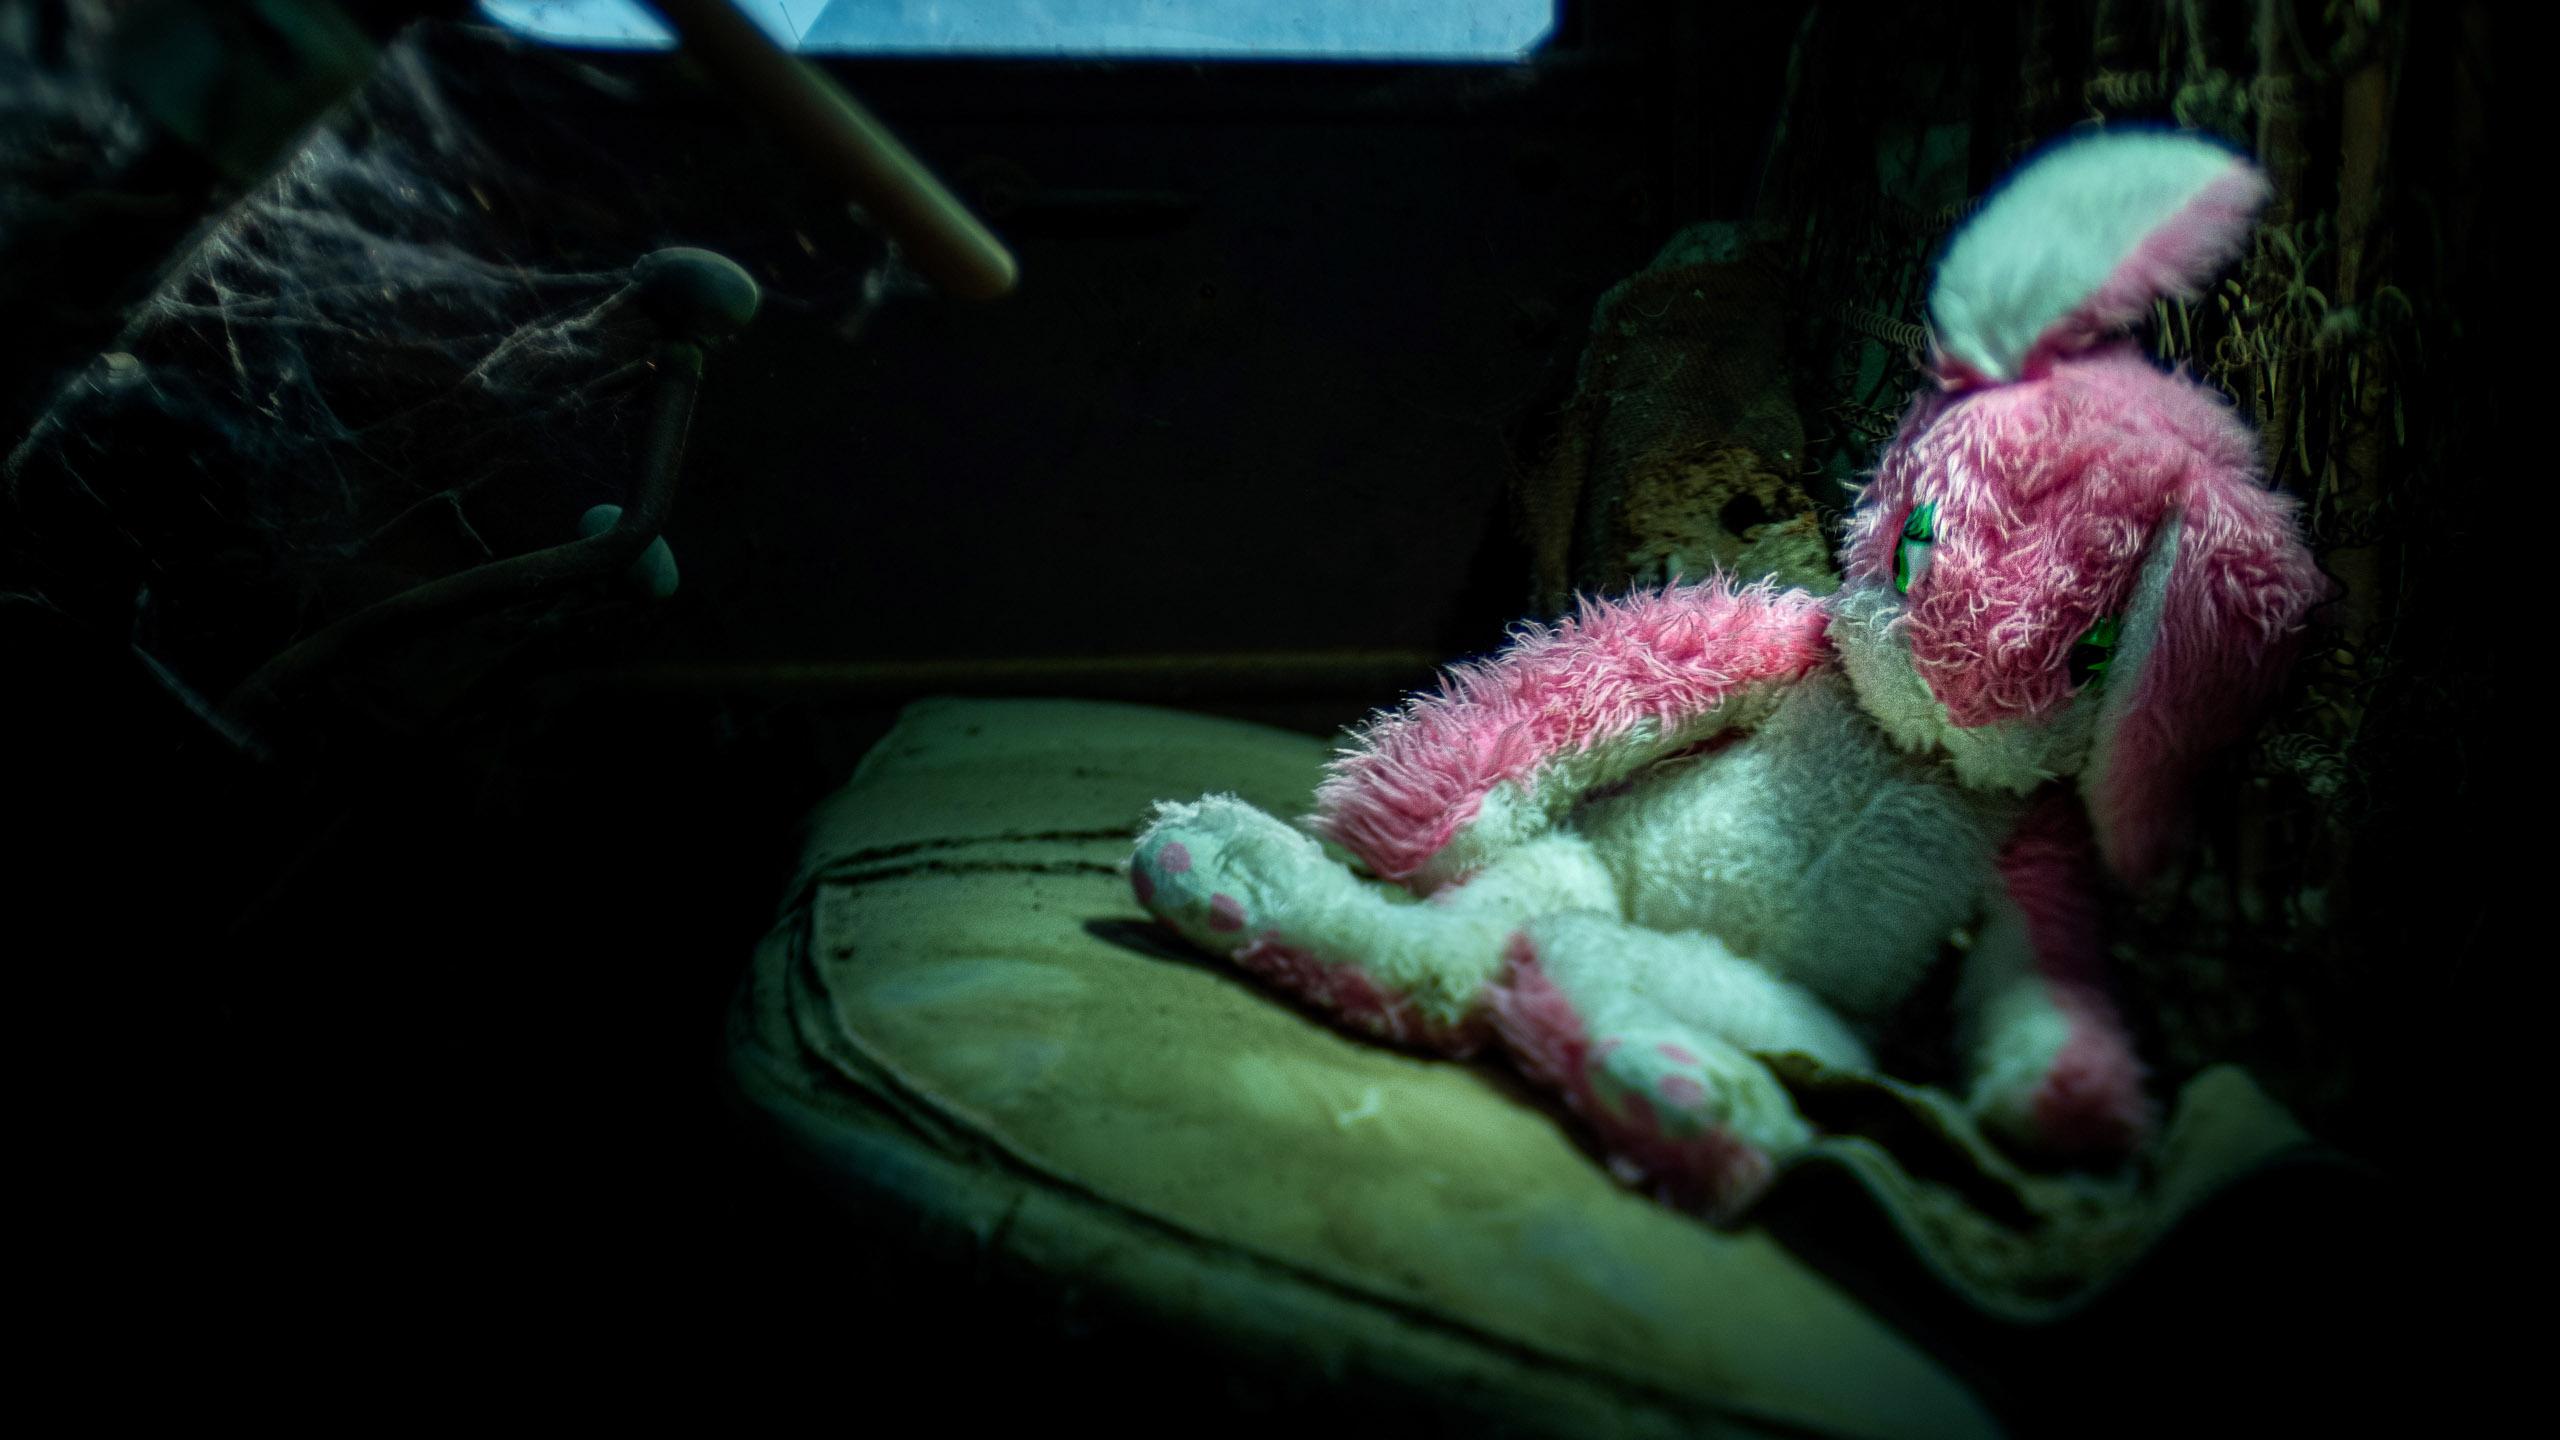 HEADER 2842_kenlee_eaglefield_201031_2007_75sfwhoknowsiso200_creepy-bunny-chevy-truck-interior-lensbaby_flat2-HEADER PHOTOFOCUS